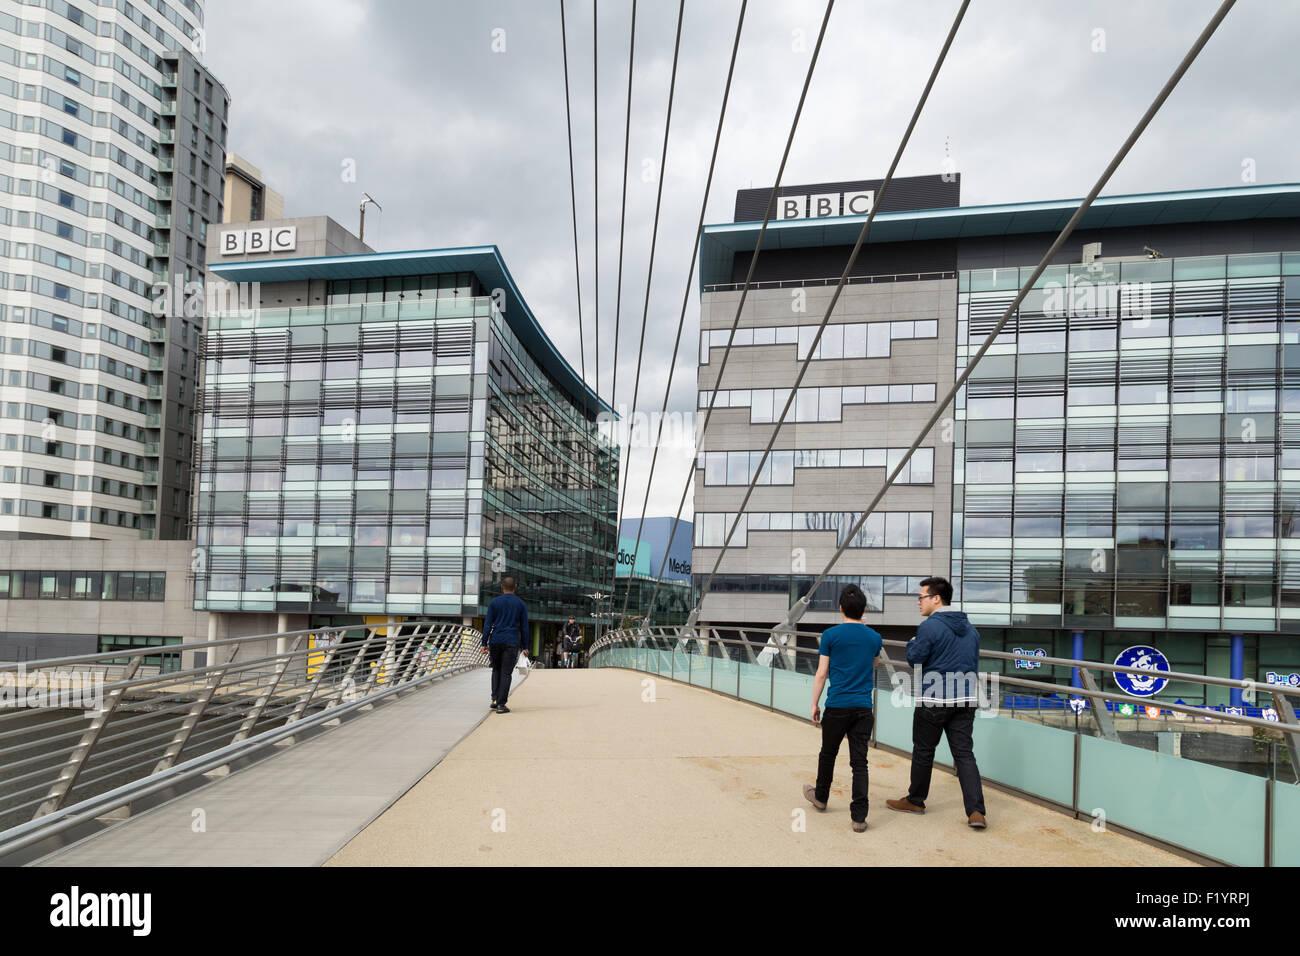 BBC studios at MediaCityUK at Salford Quays, Manchester, England. UK - Stock Image